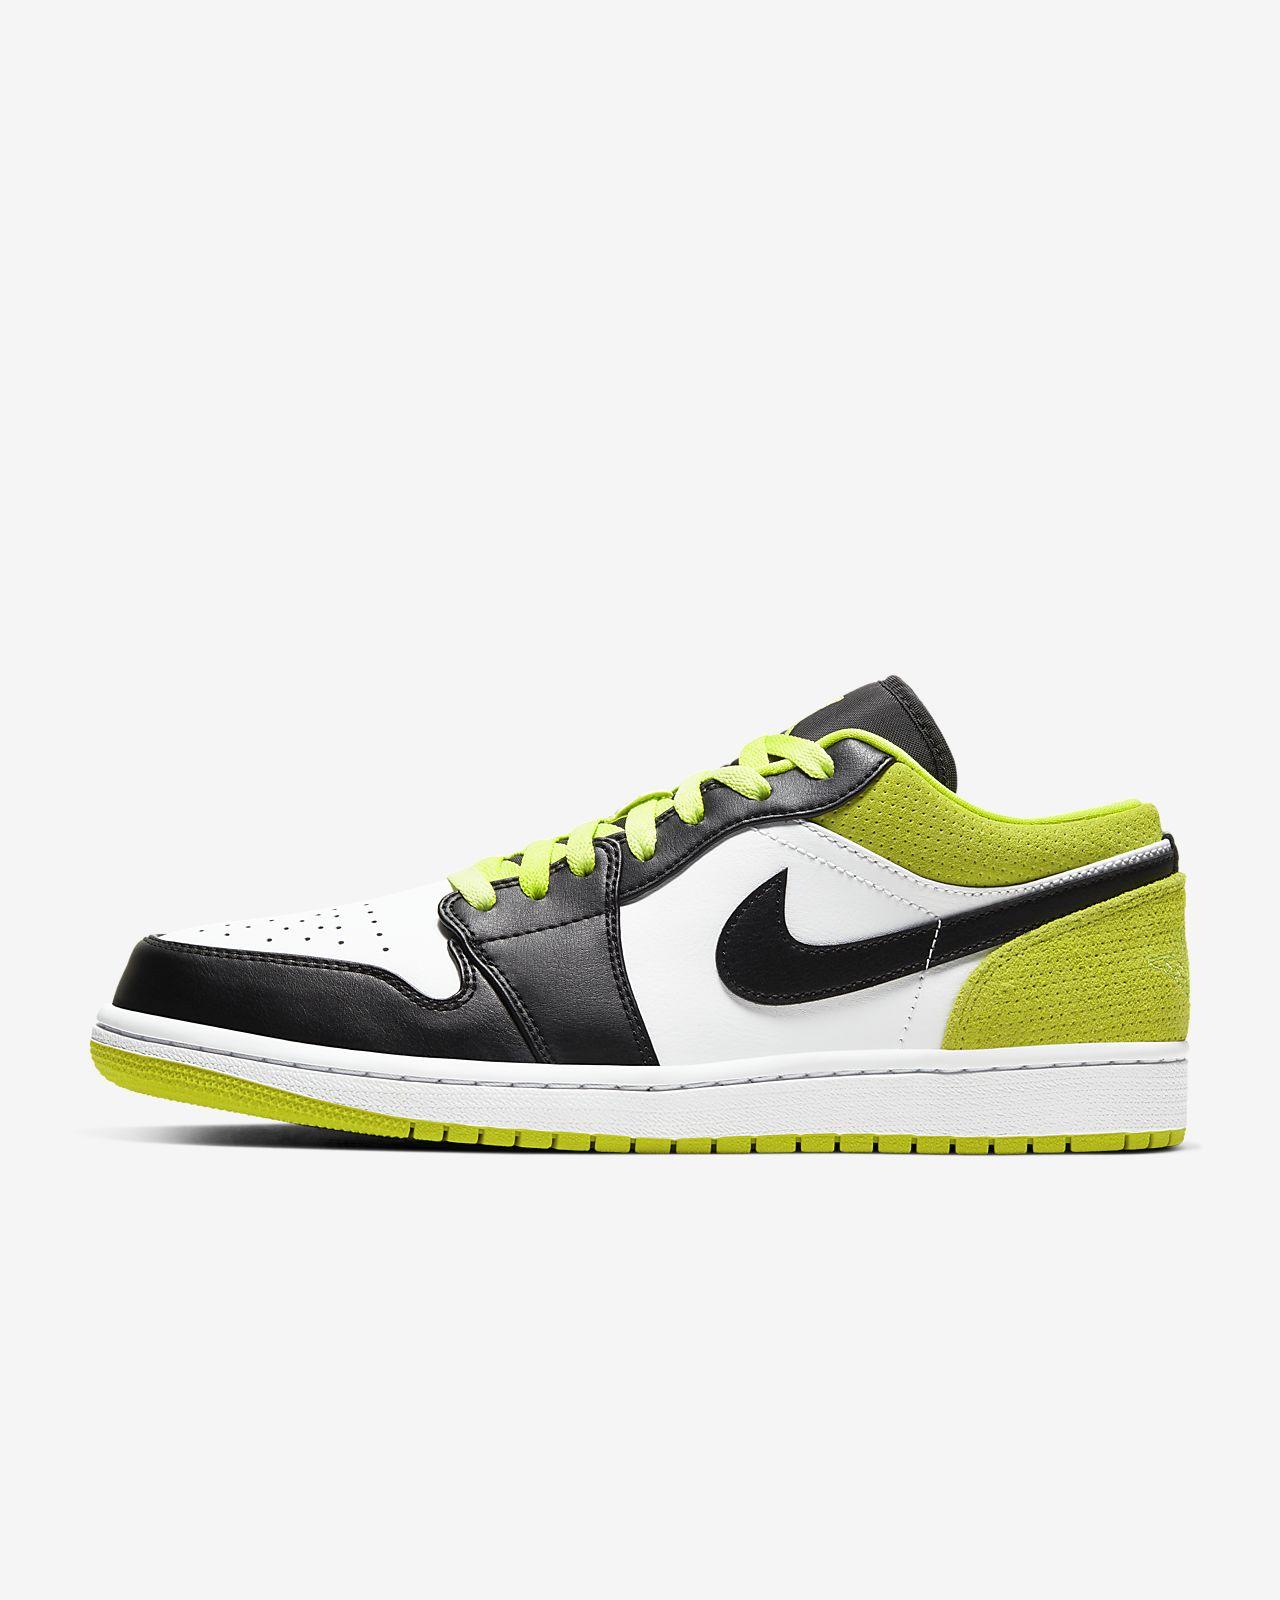 Air Jordan 1 低筒 SE 鞋款